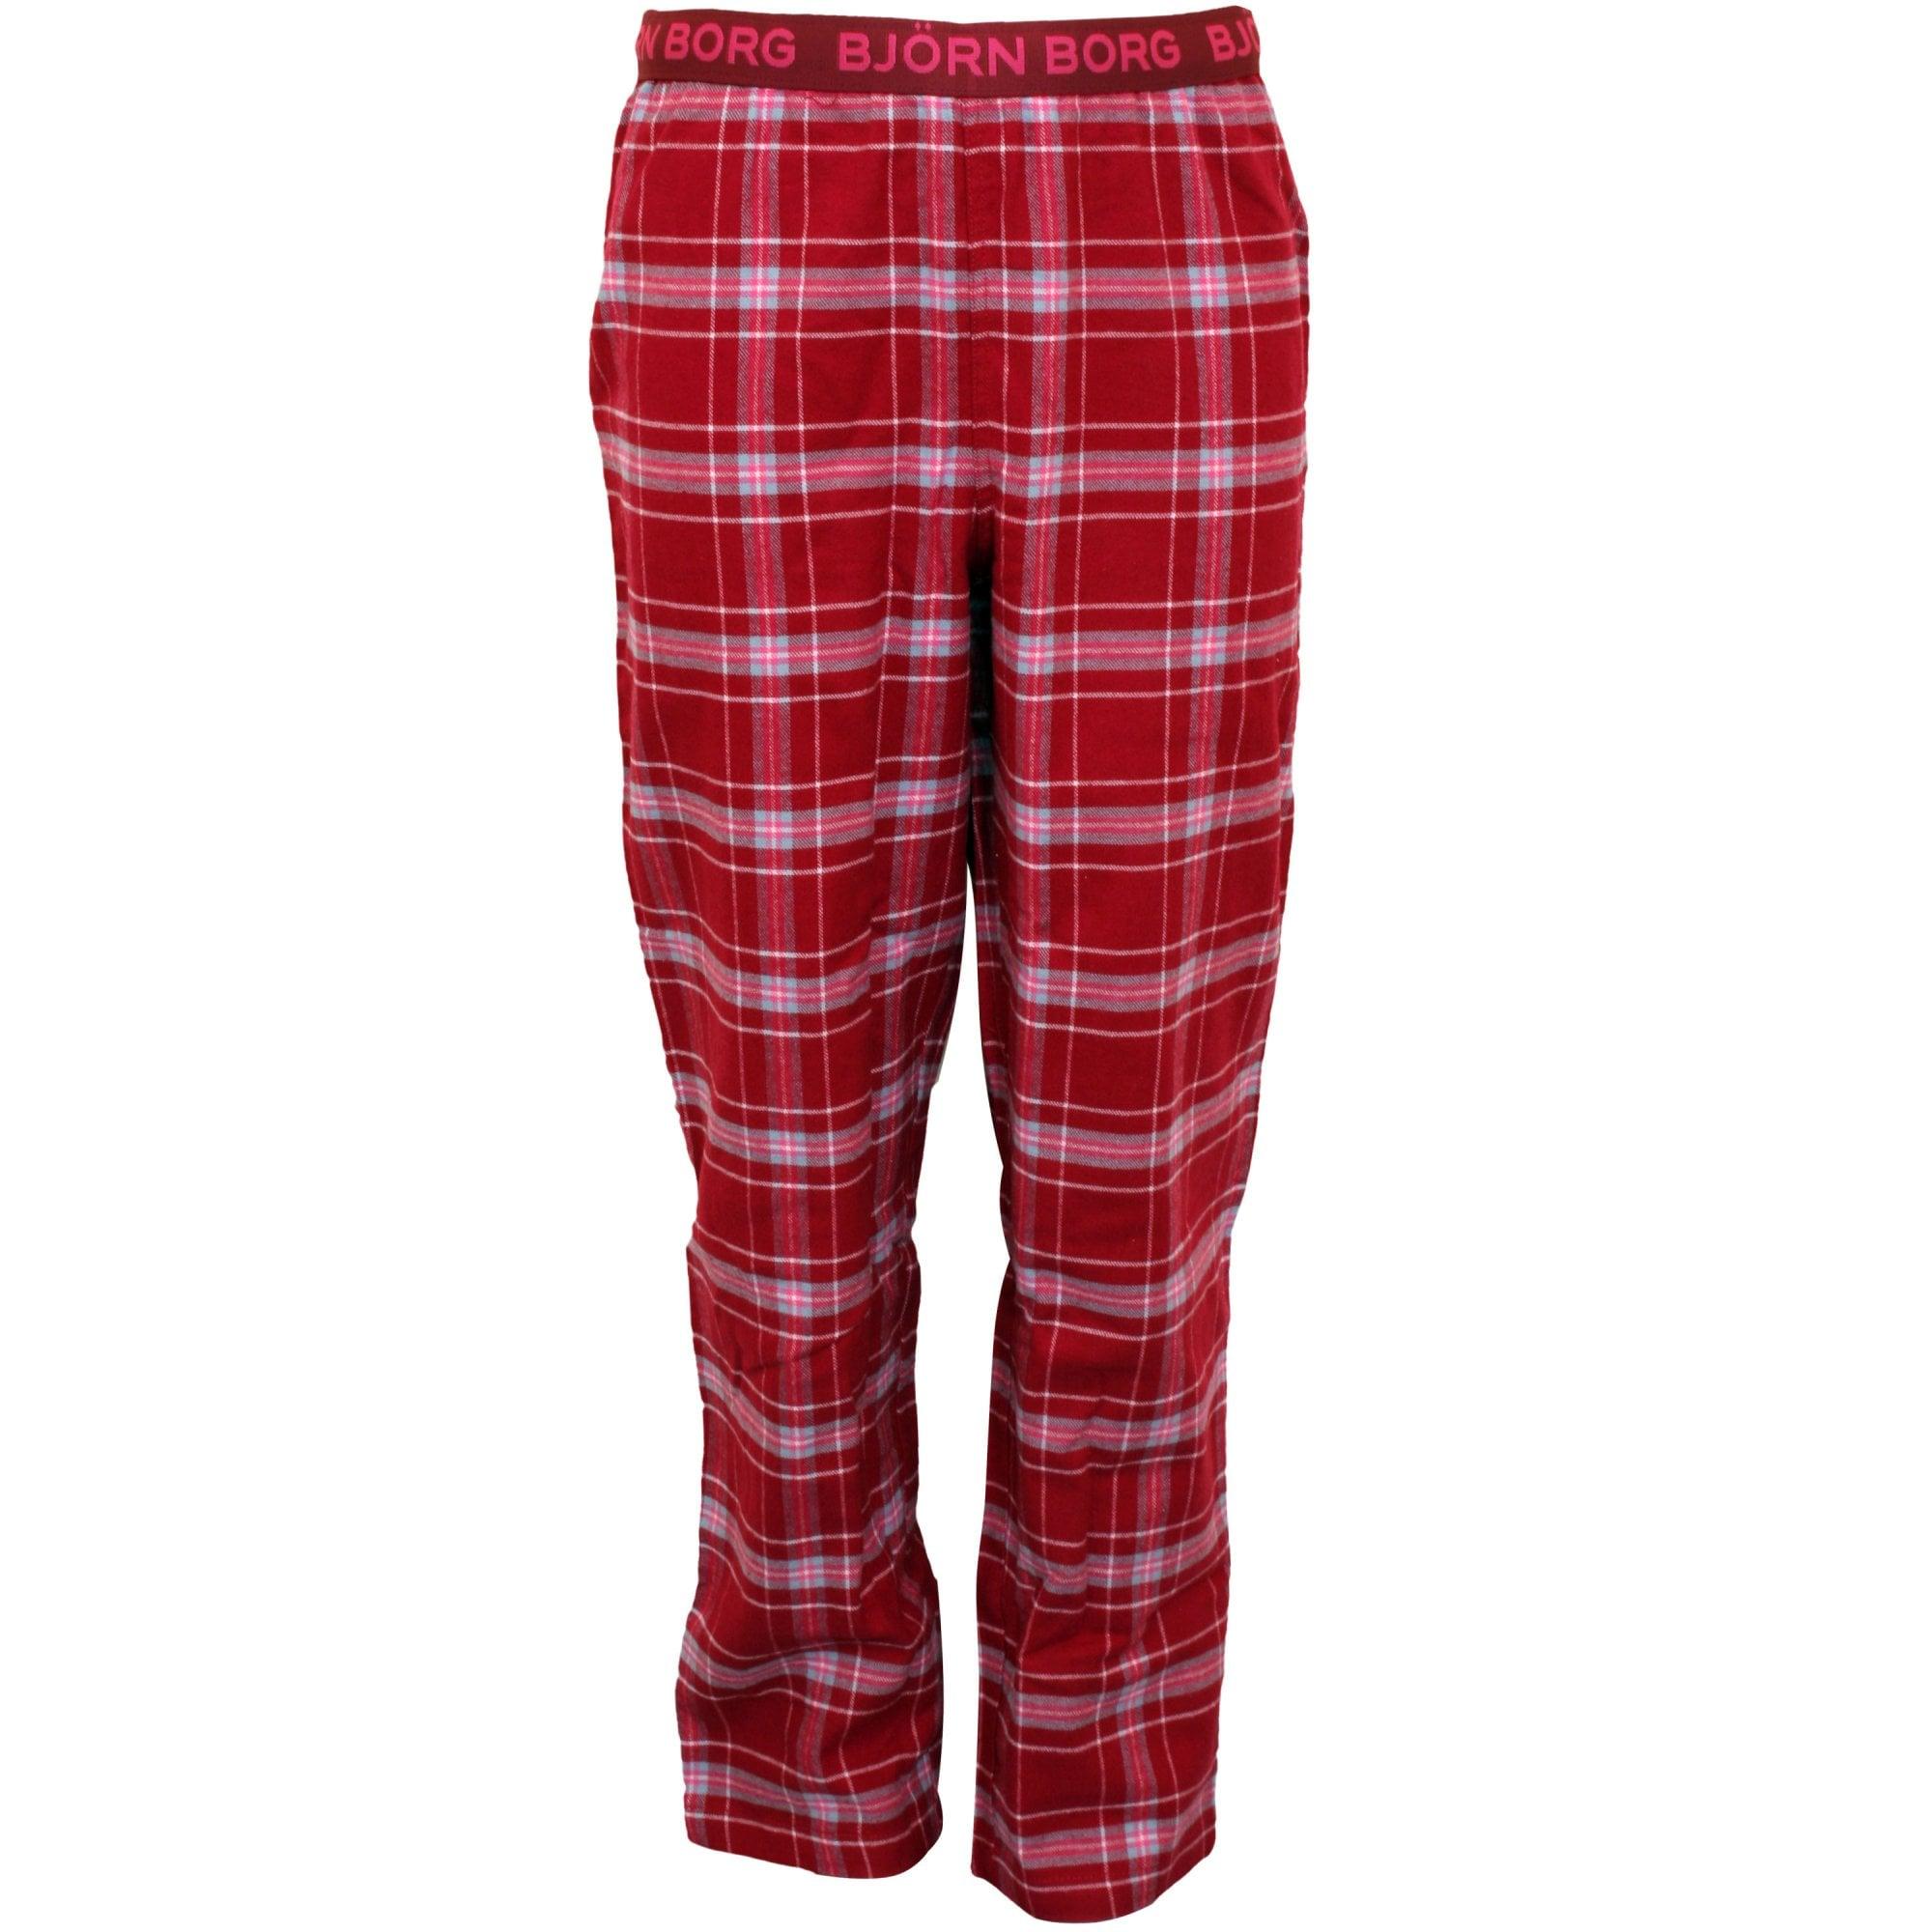 Bjorn Borg Boys Check Flannel Boys Pyjama Bottoms, Rumba Red | UnderU